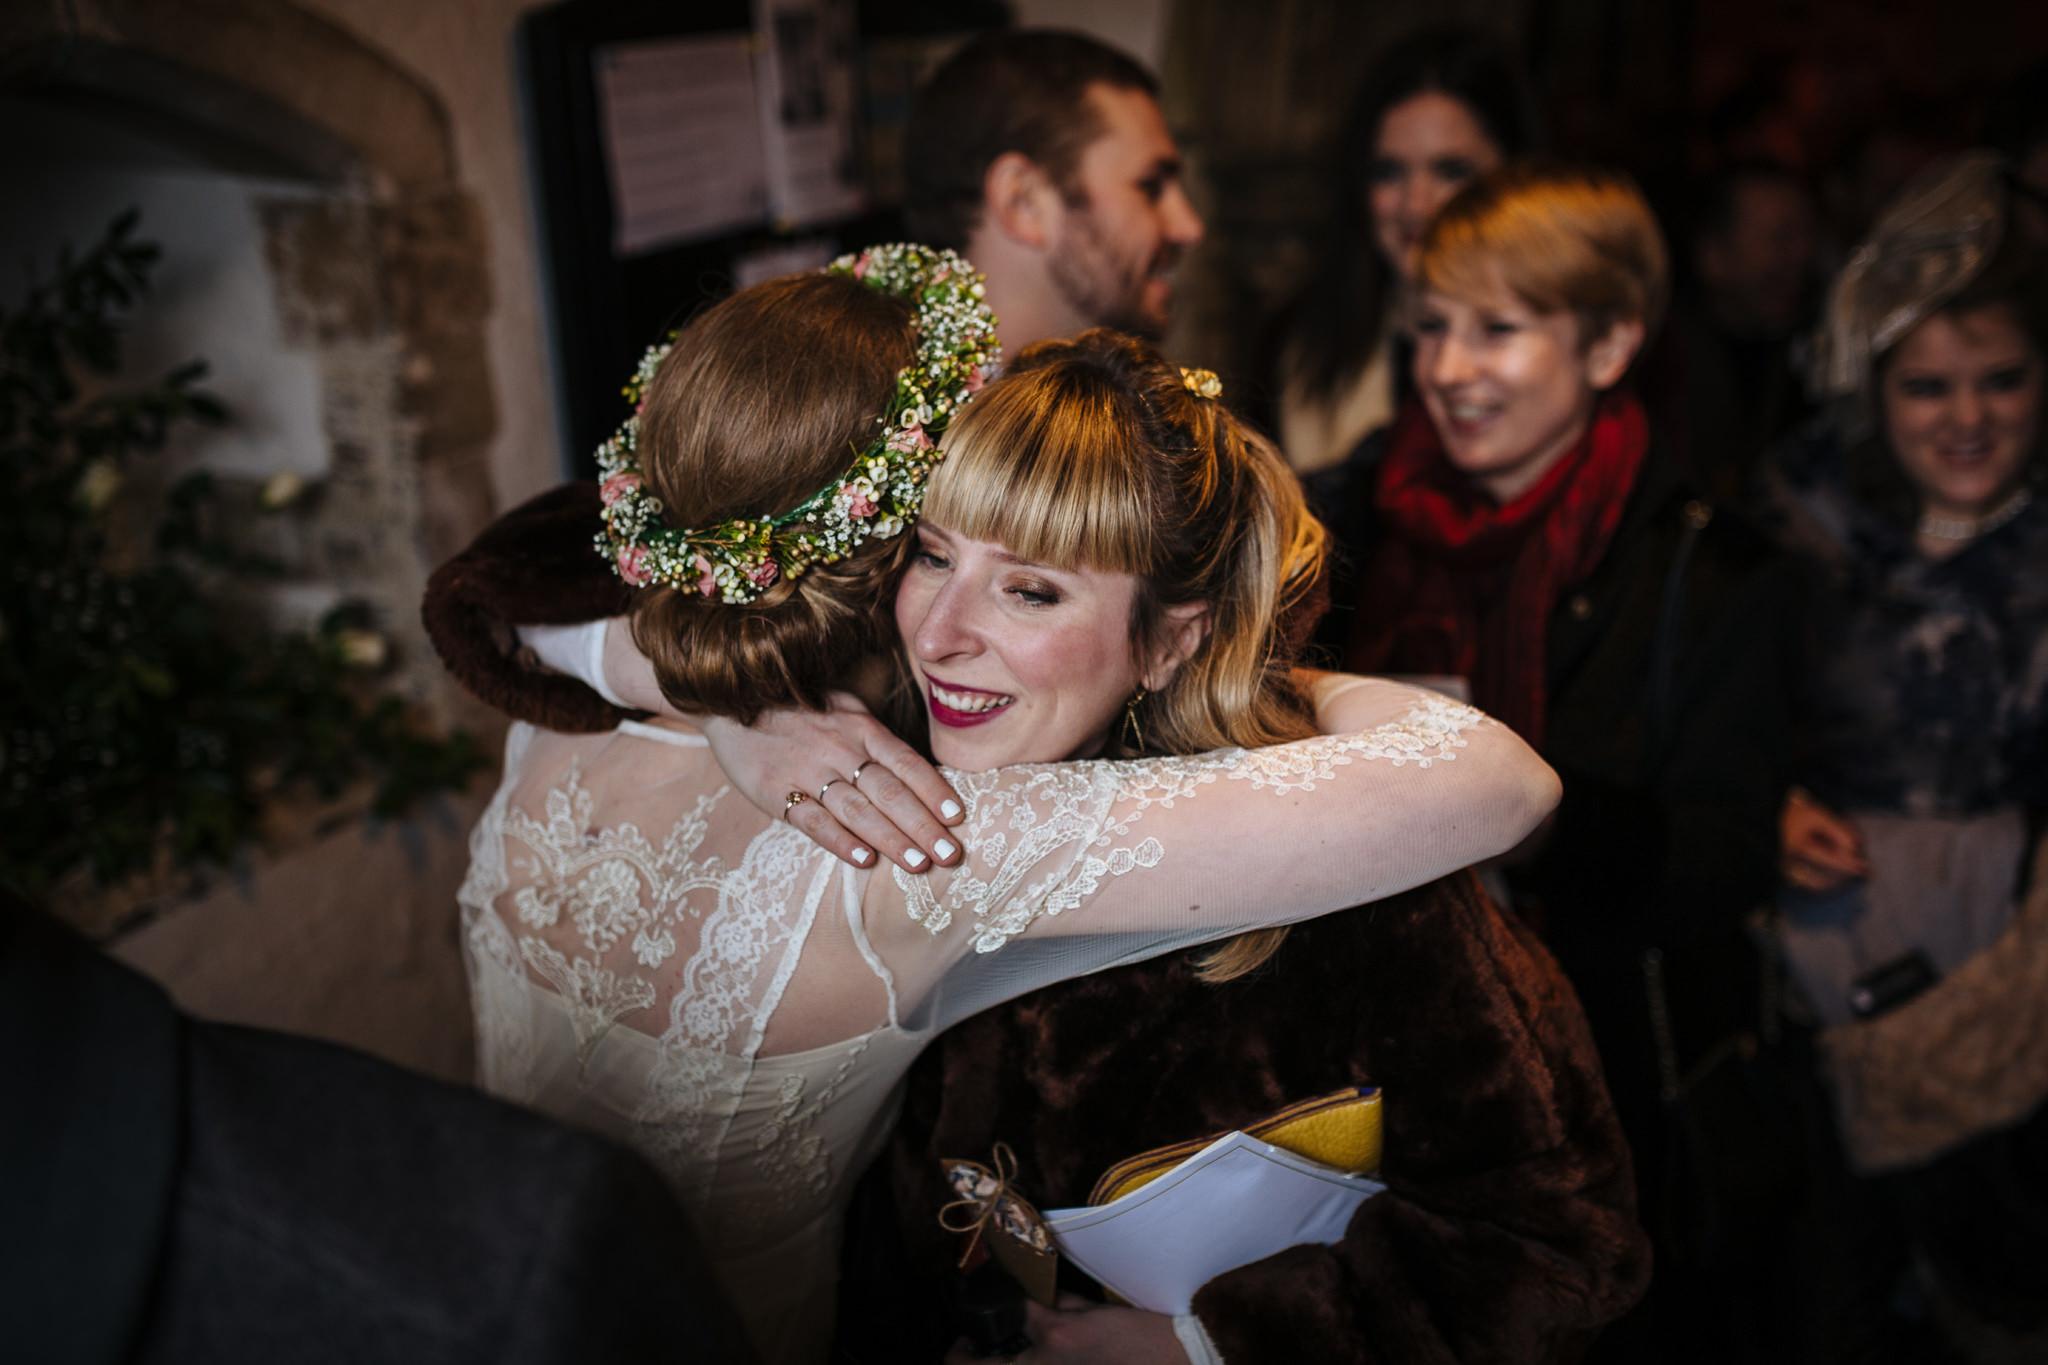 Creative-reportage-wedding-photography-90024